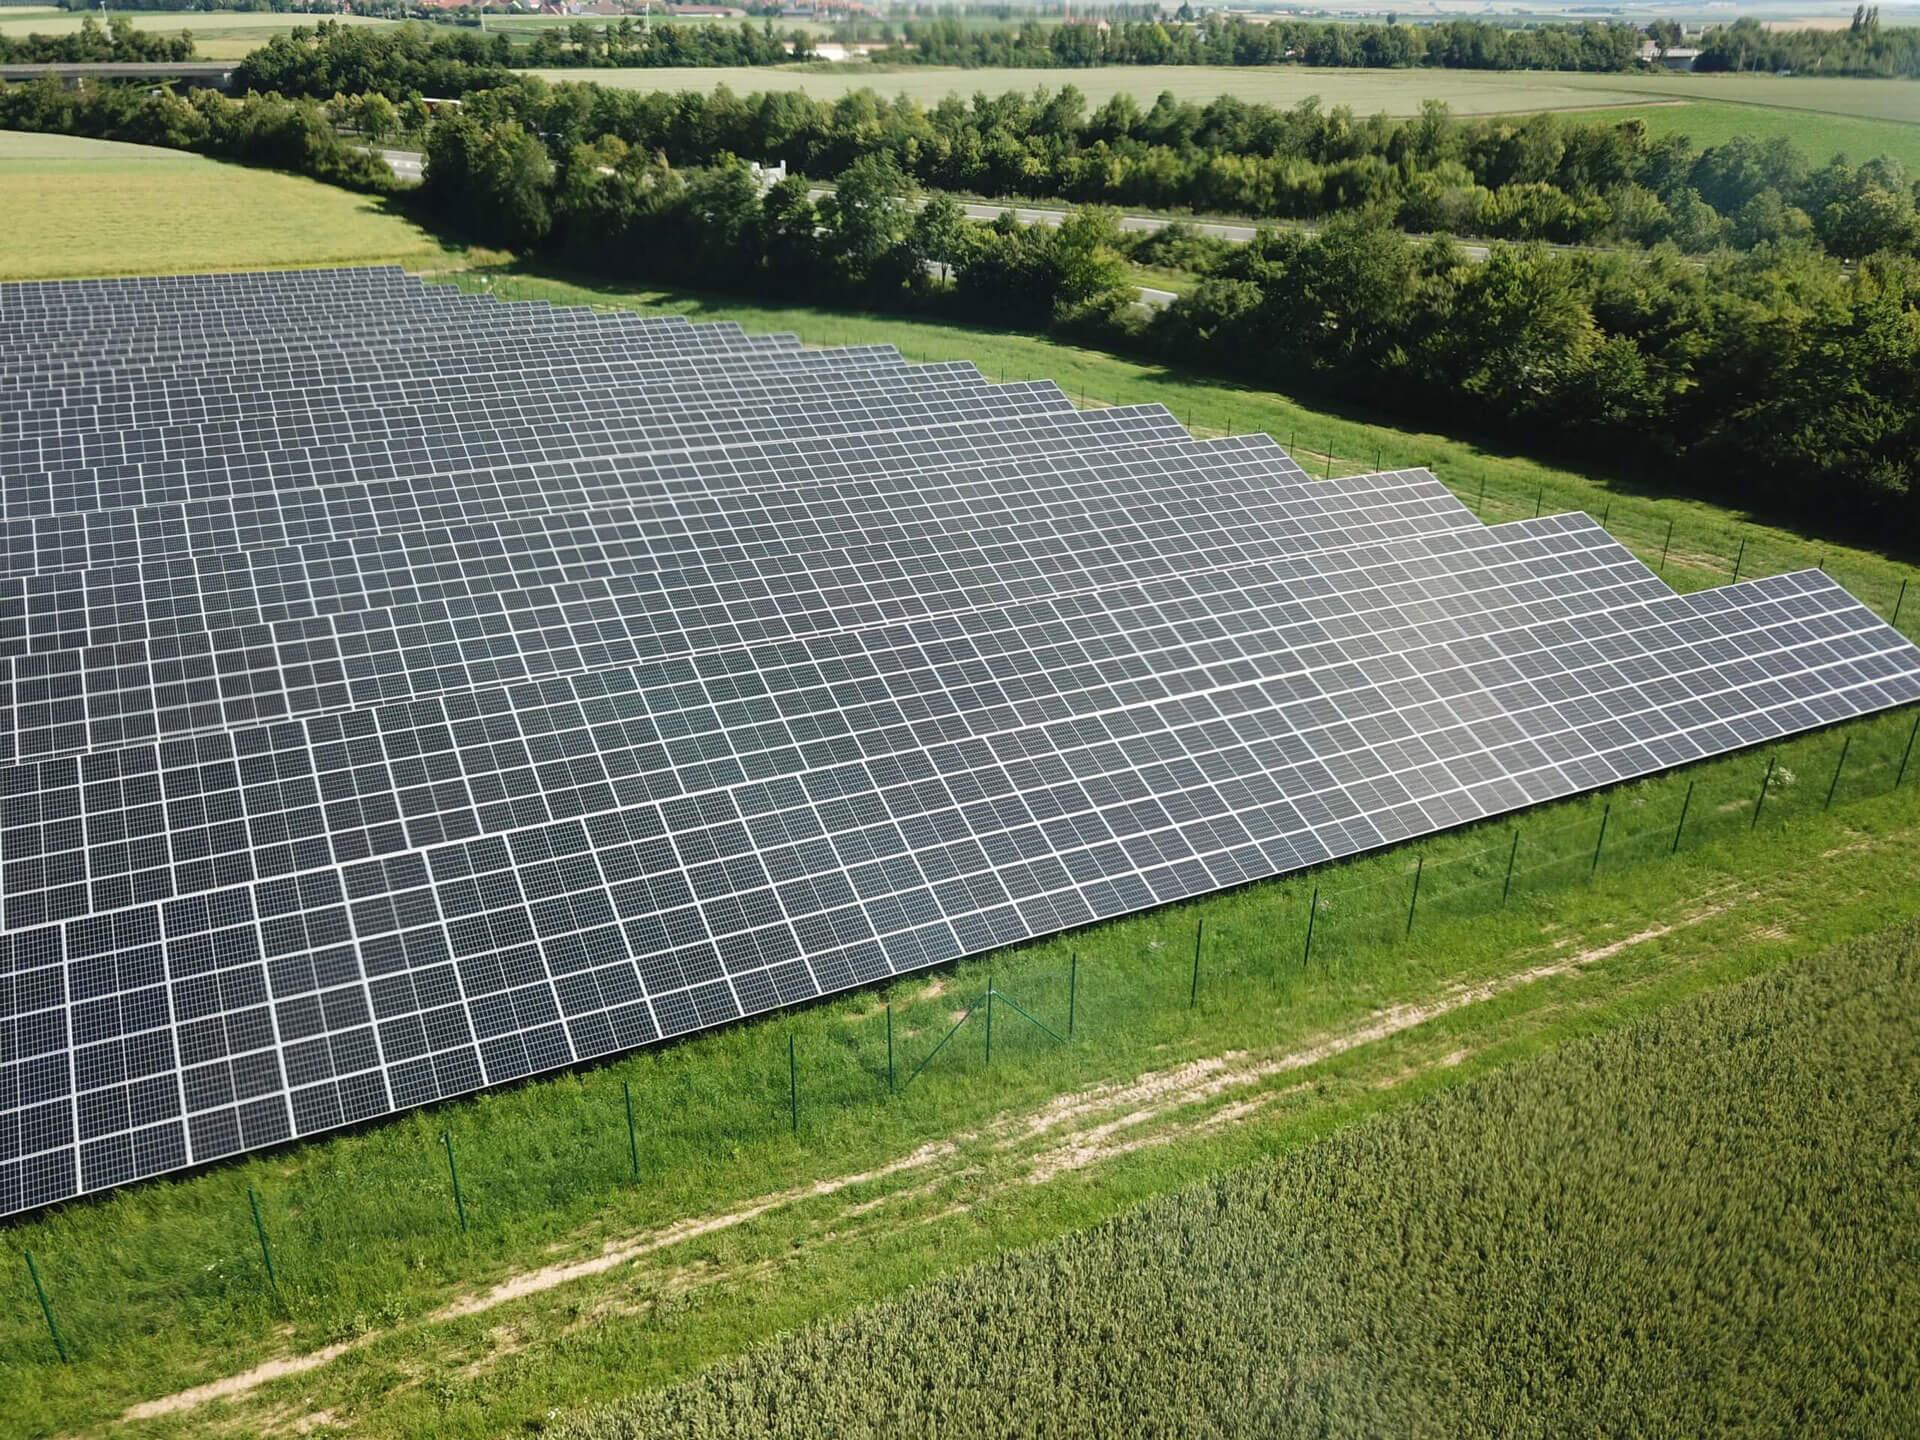 Solarpark Dettelbach